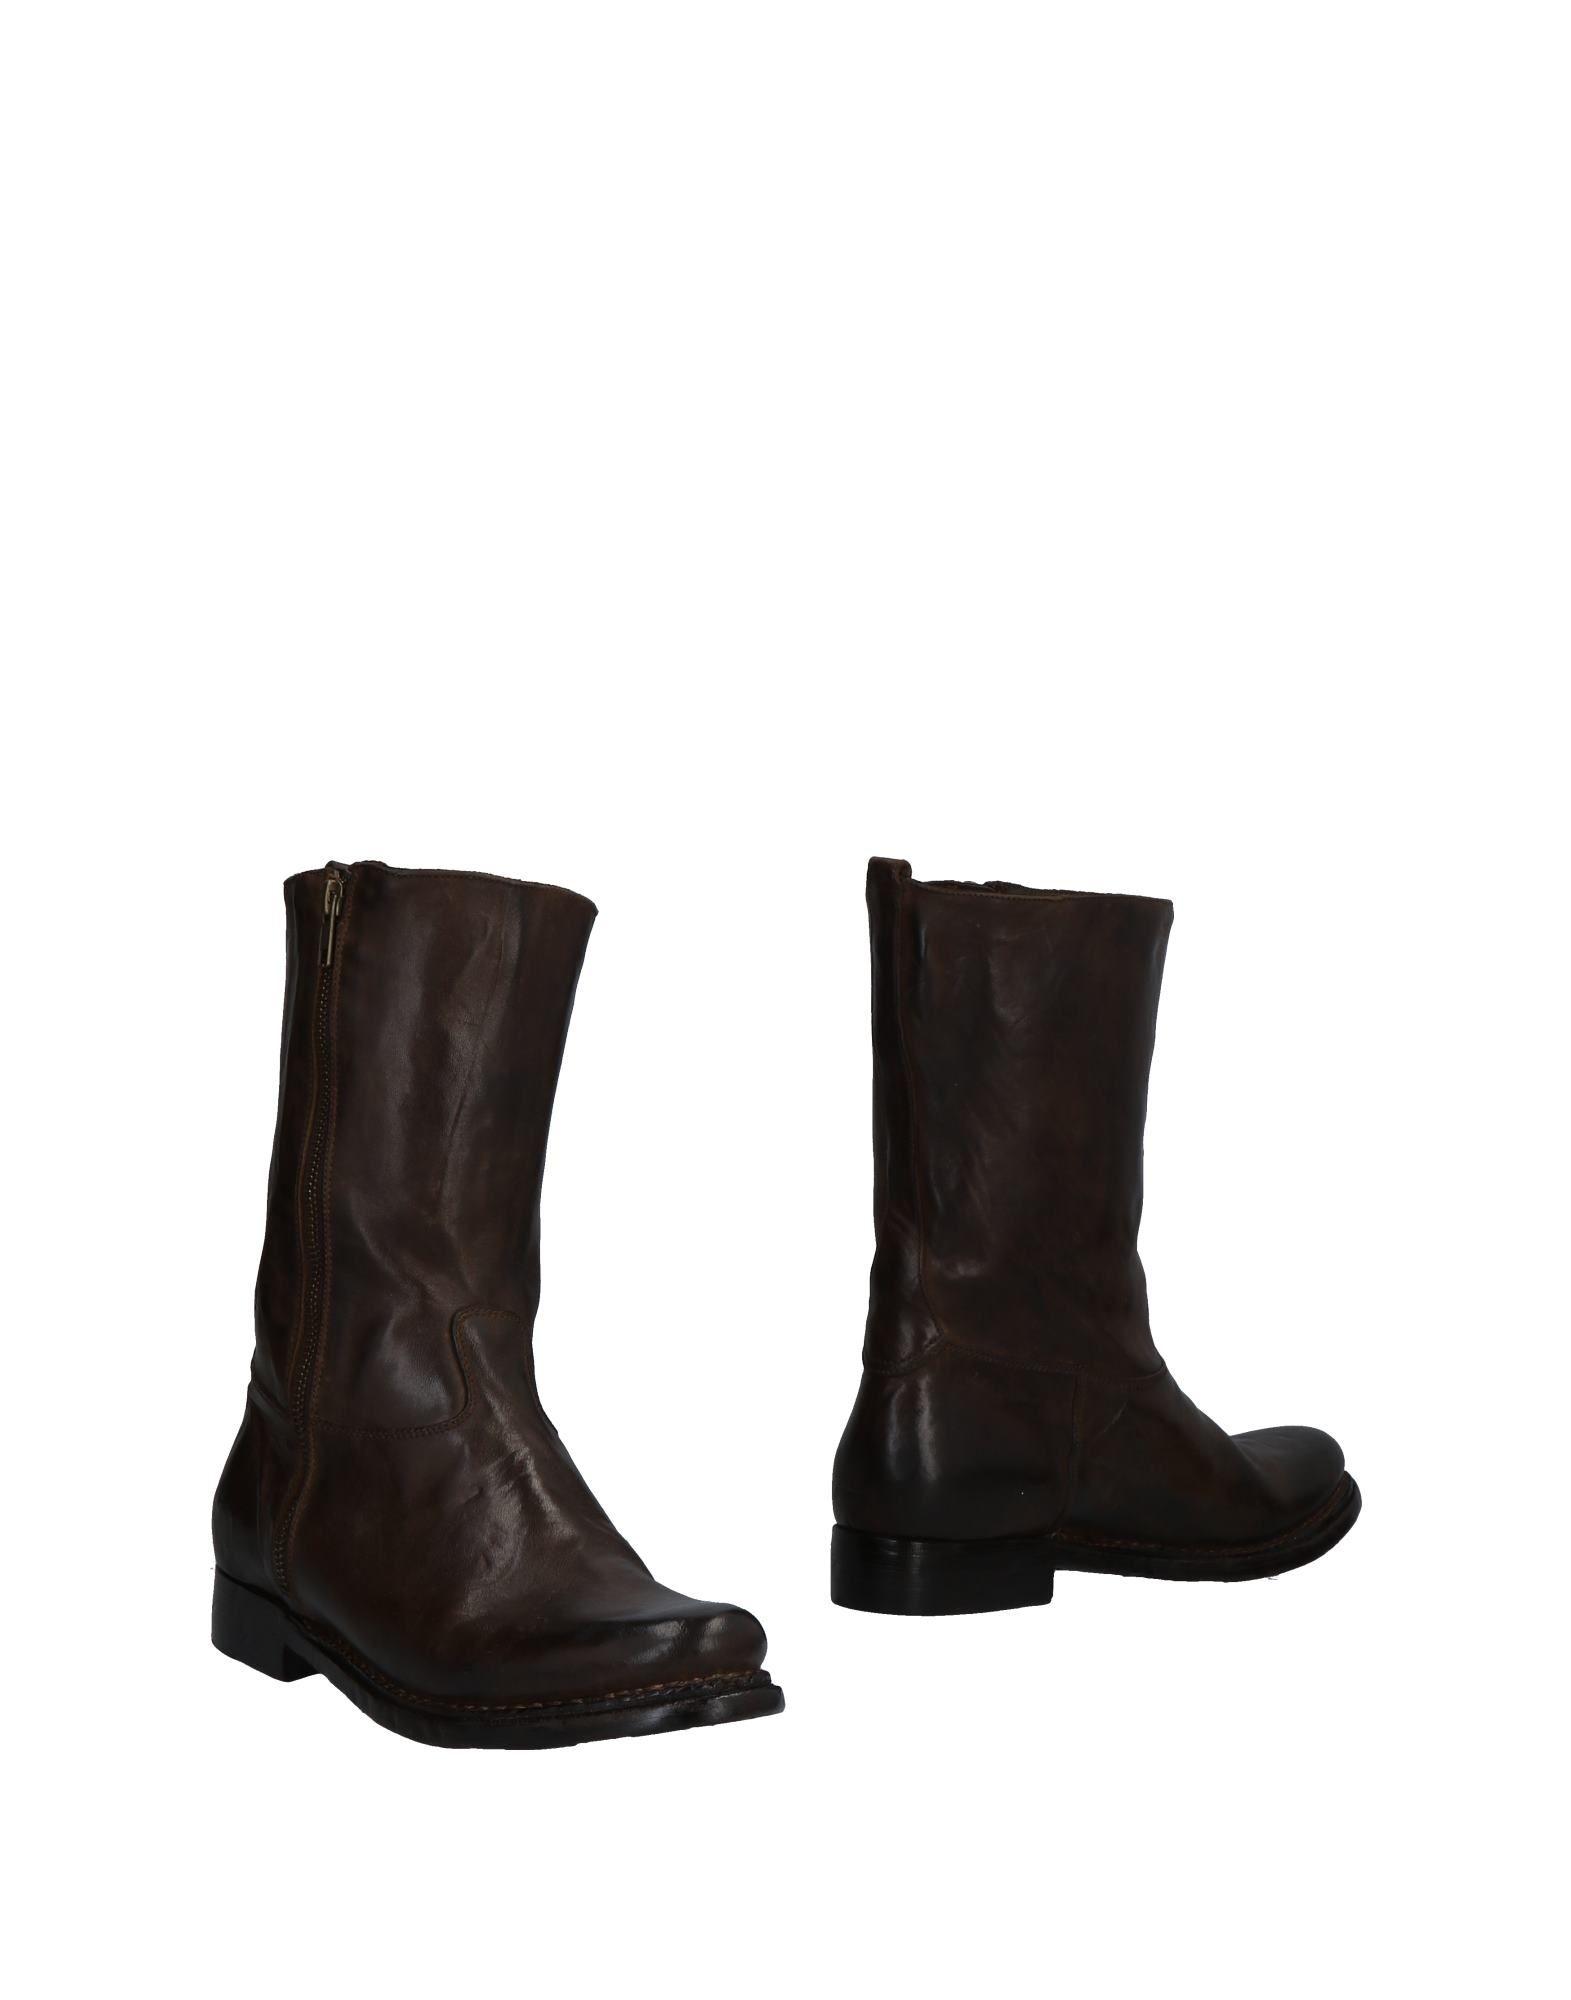 Rabatt Schuhe 11493349WR Silvano Sassetti Stiefelette Damen 11493349WR Schuhe 3bf651